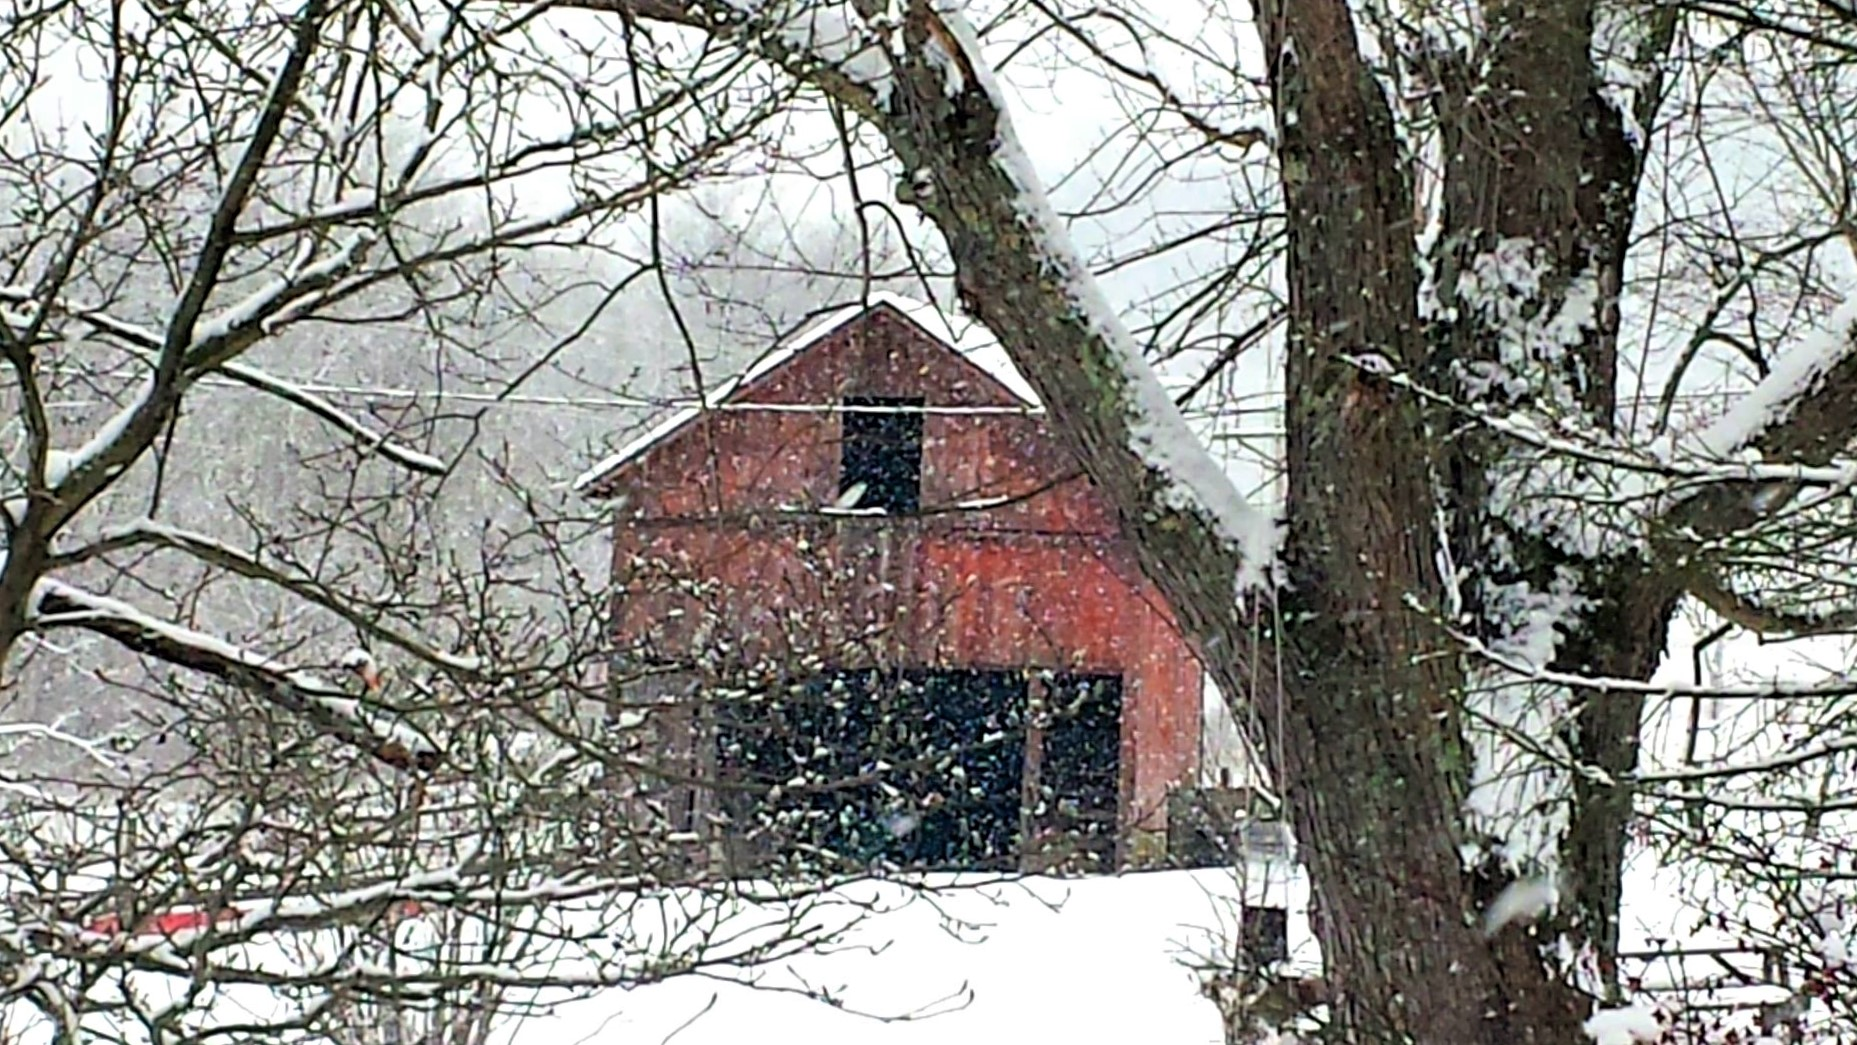 Rural winter solitude